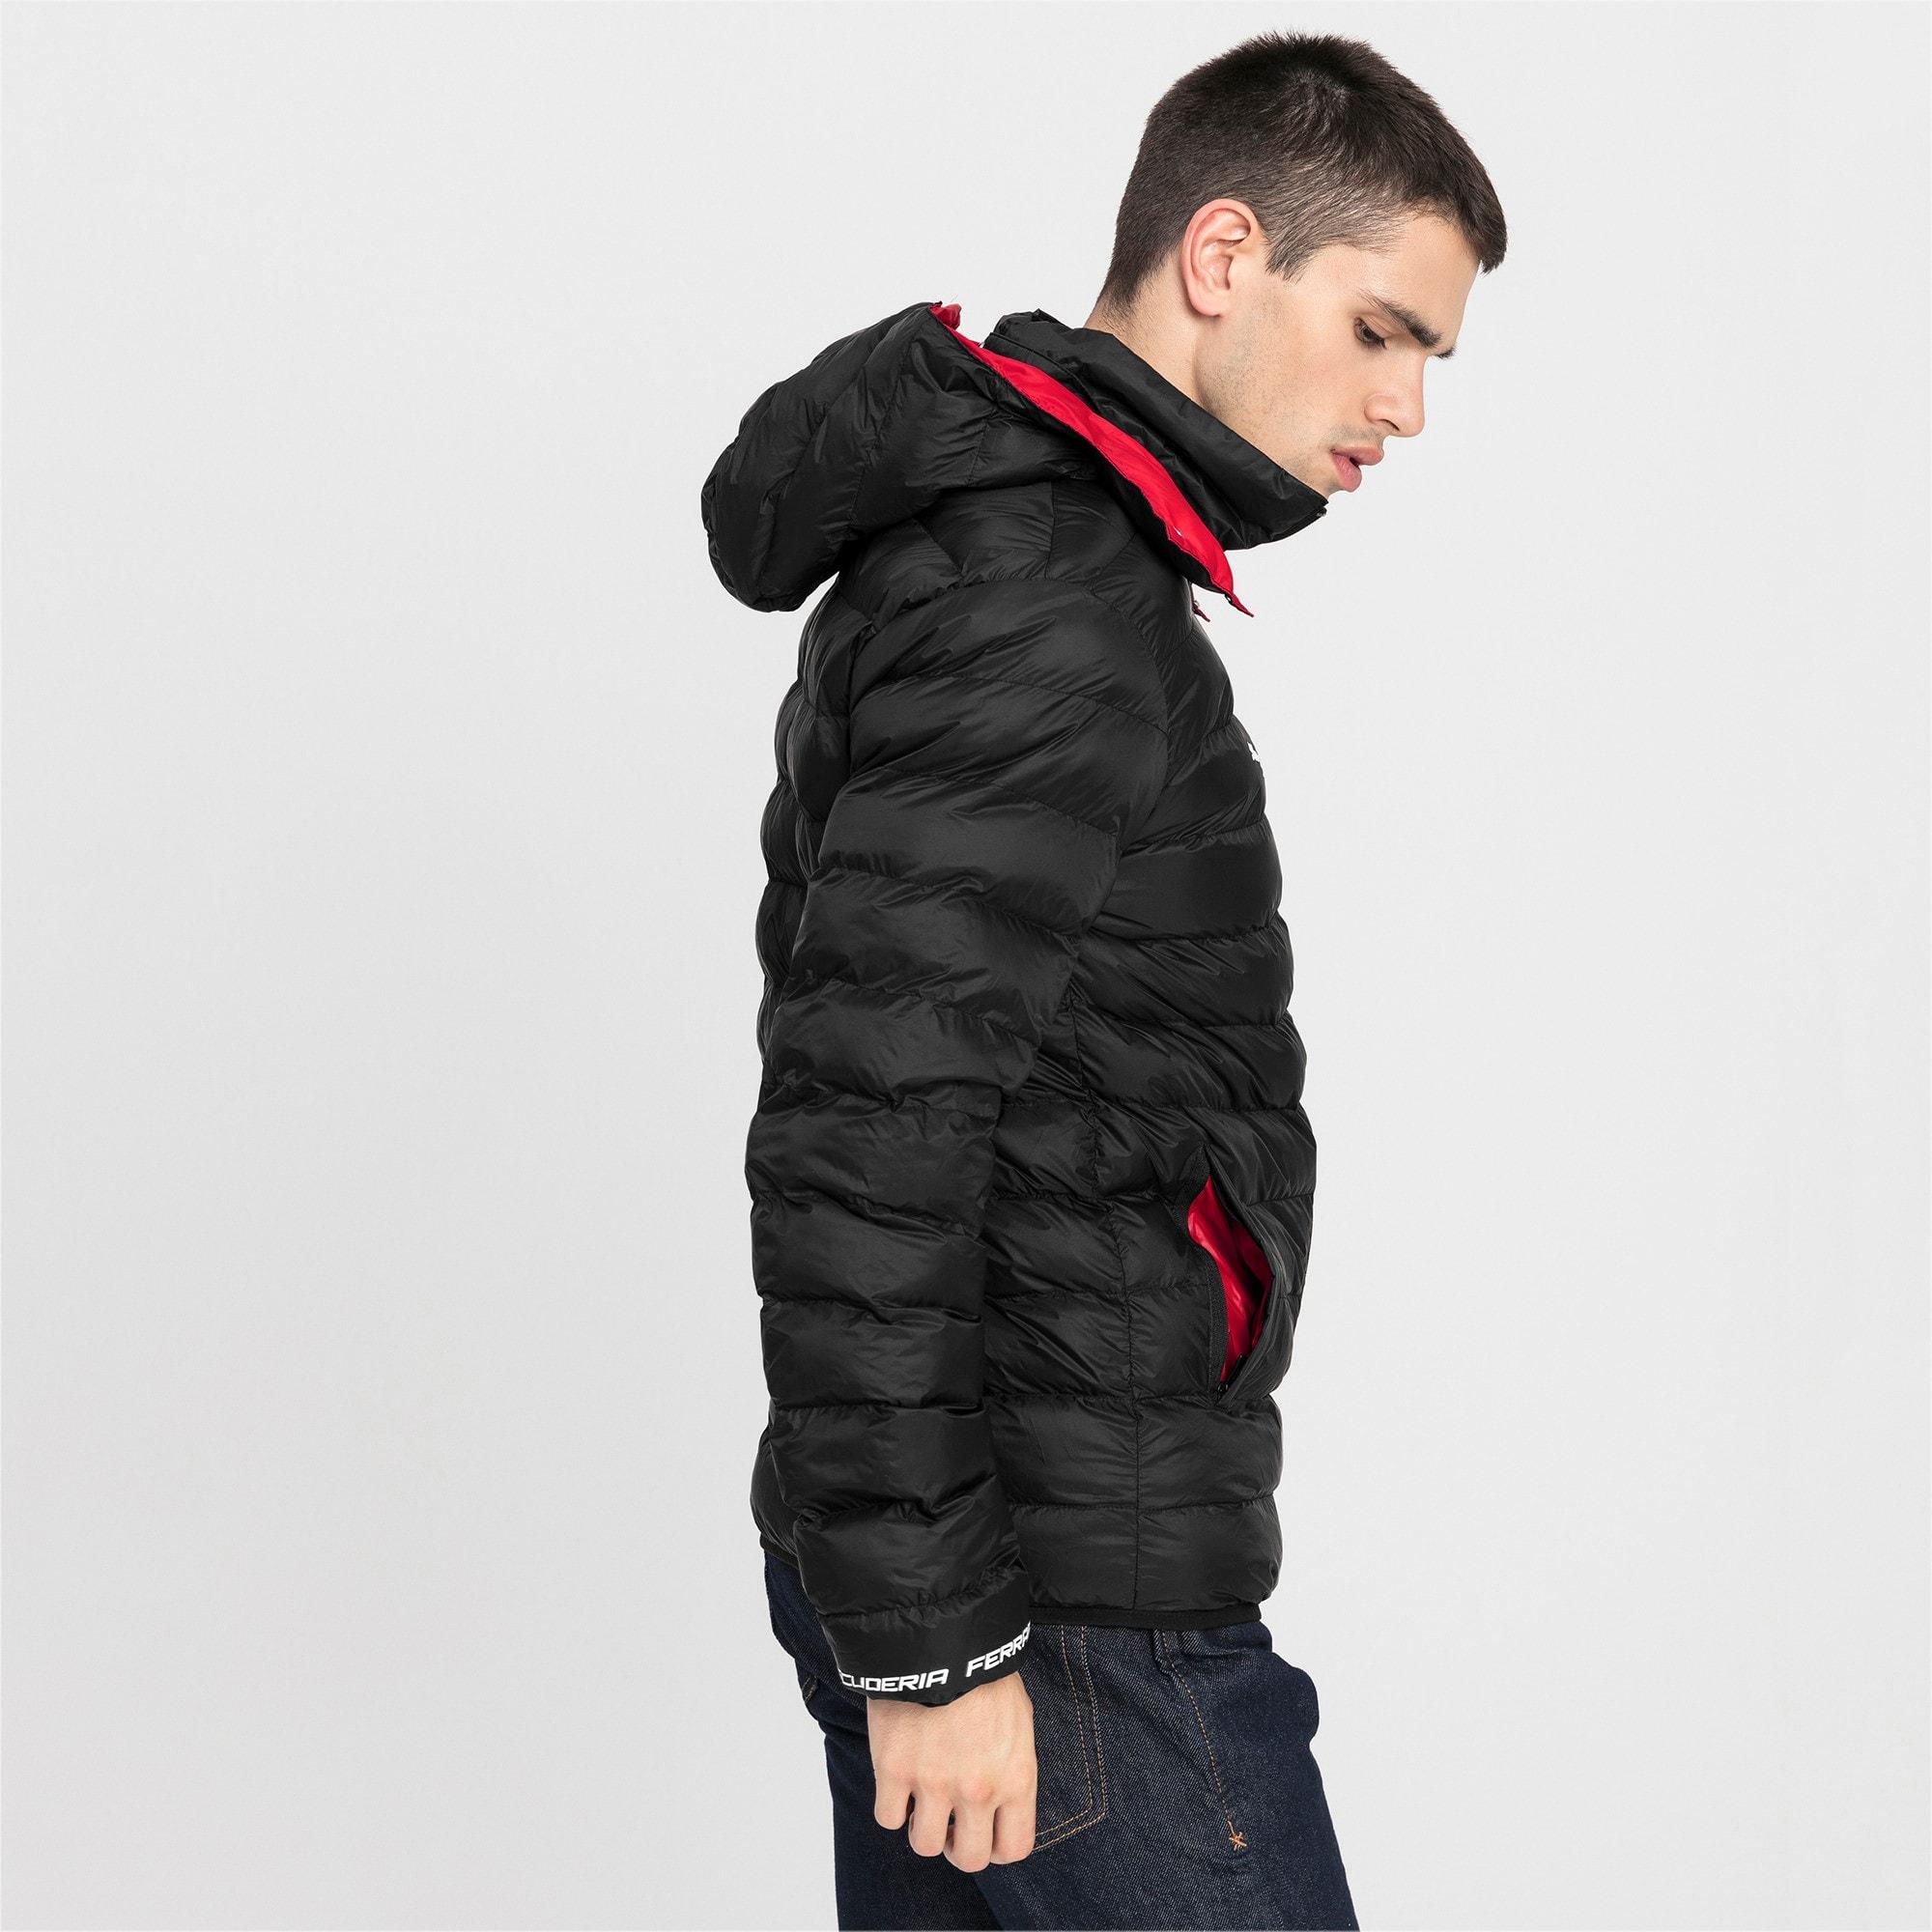 Thumbnail 2 of Ferrari Eco PackLITE Men's Jacket, Puma Black, medium